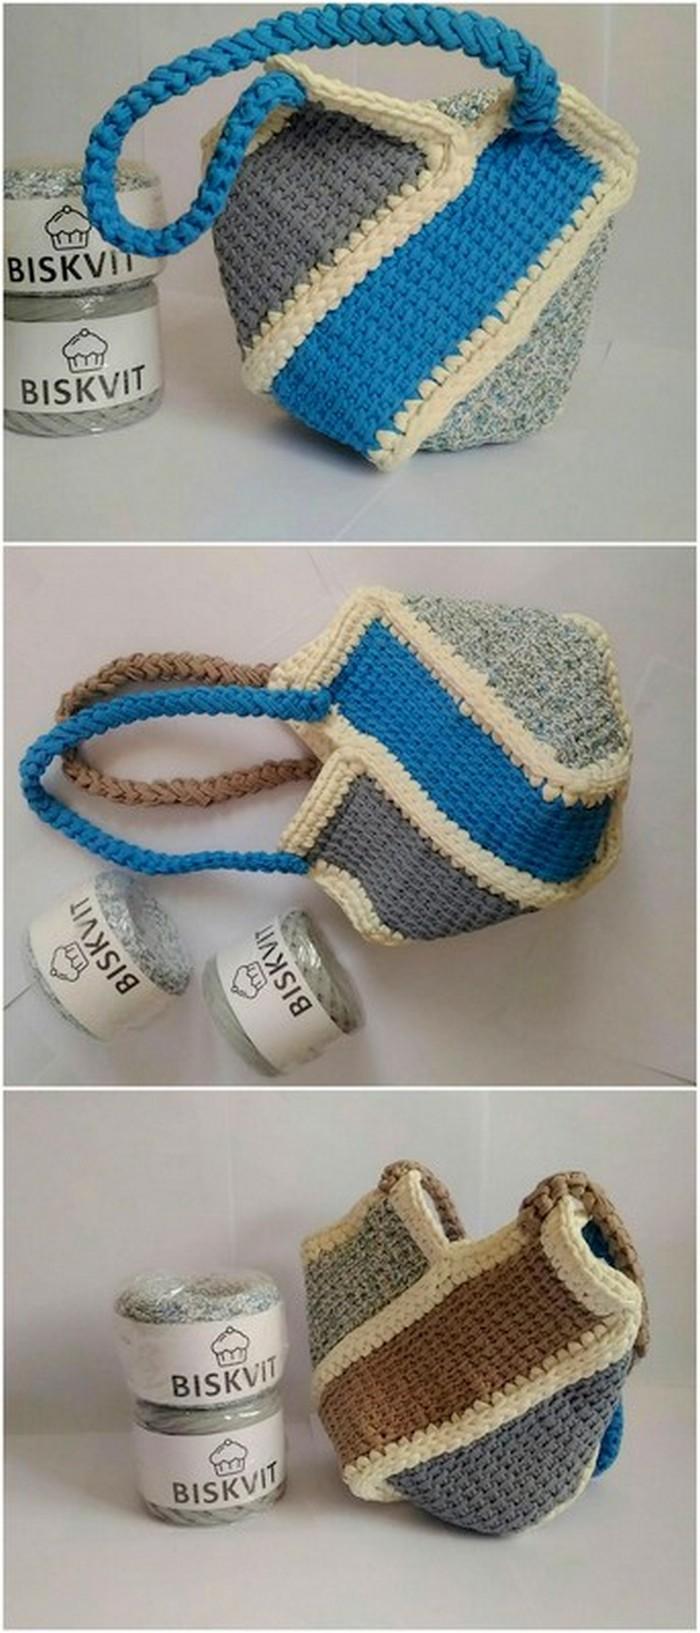 latest crochet handbag idea